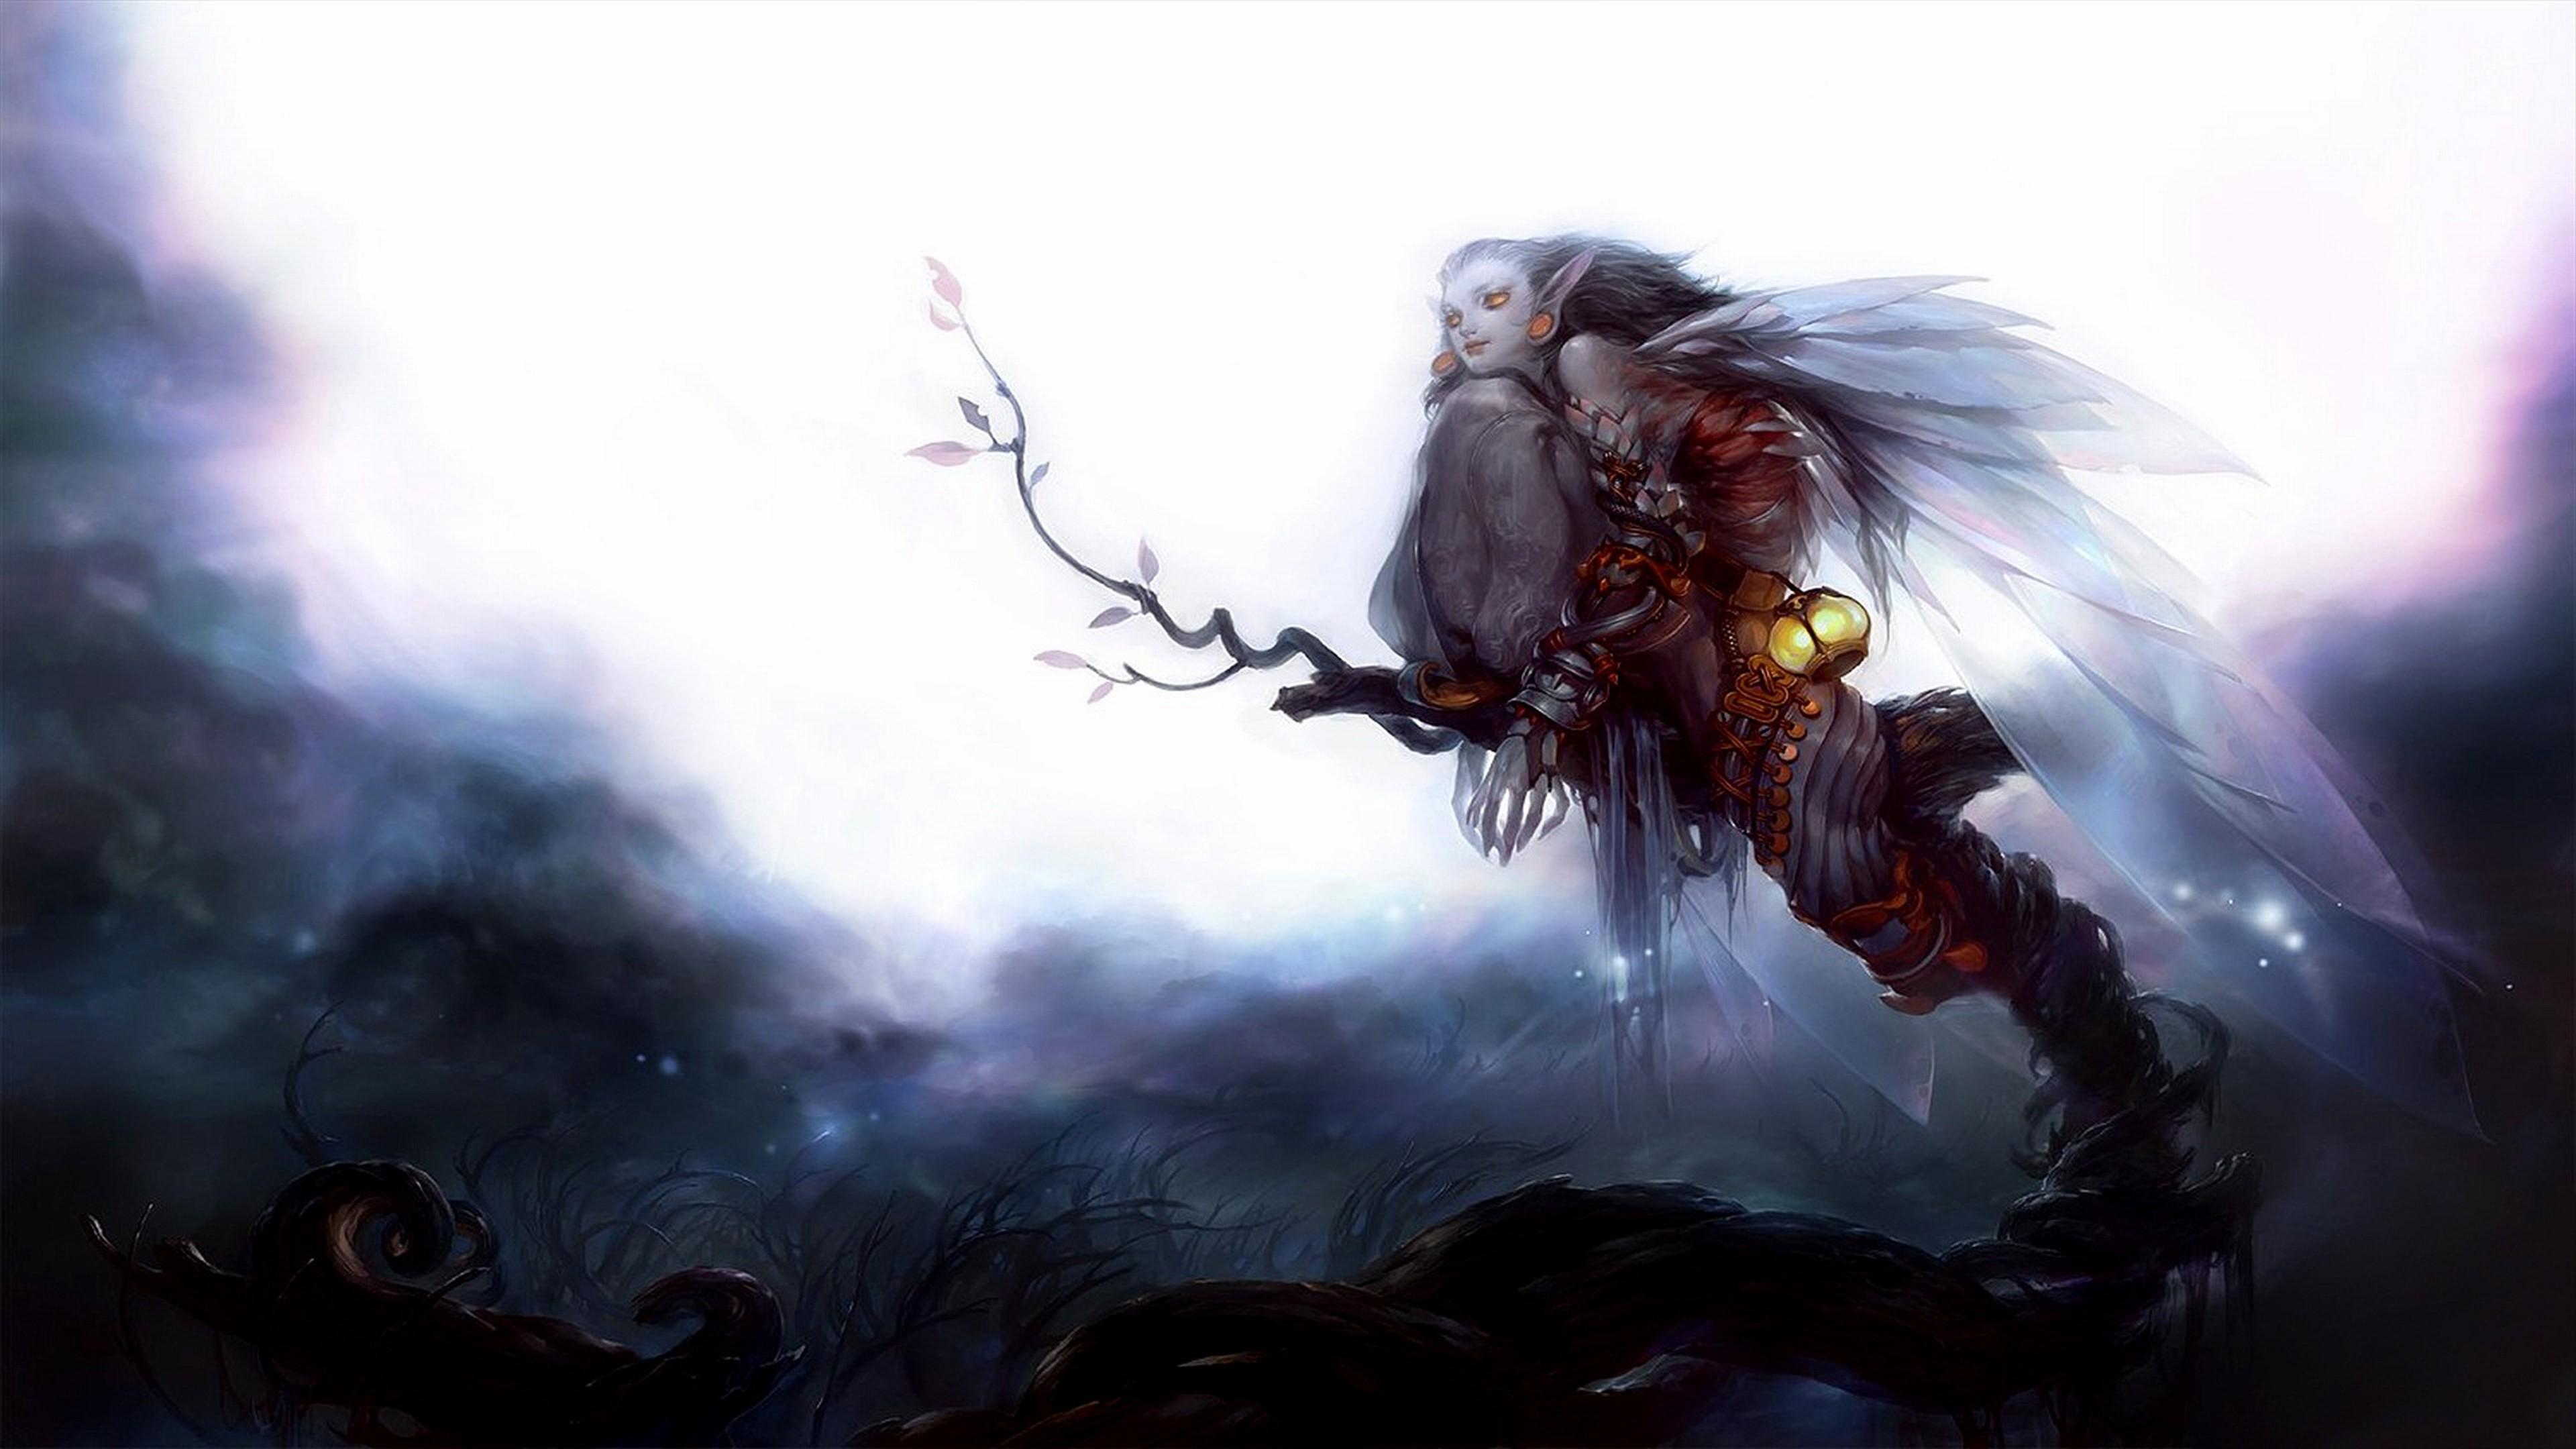 Demon-fairy-wallpaper-background